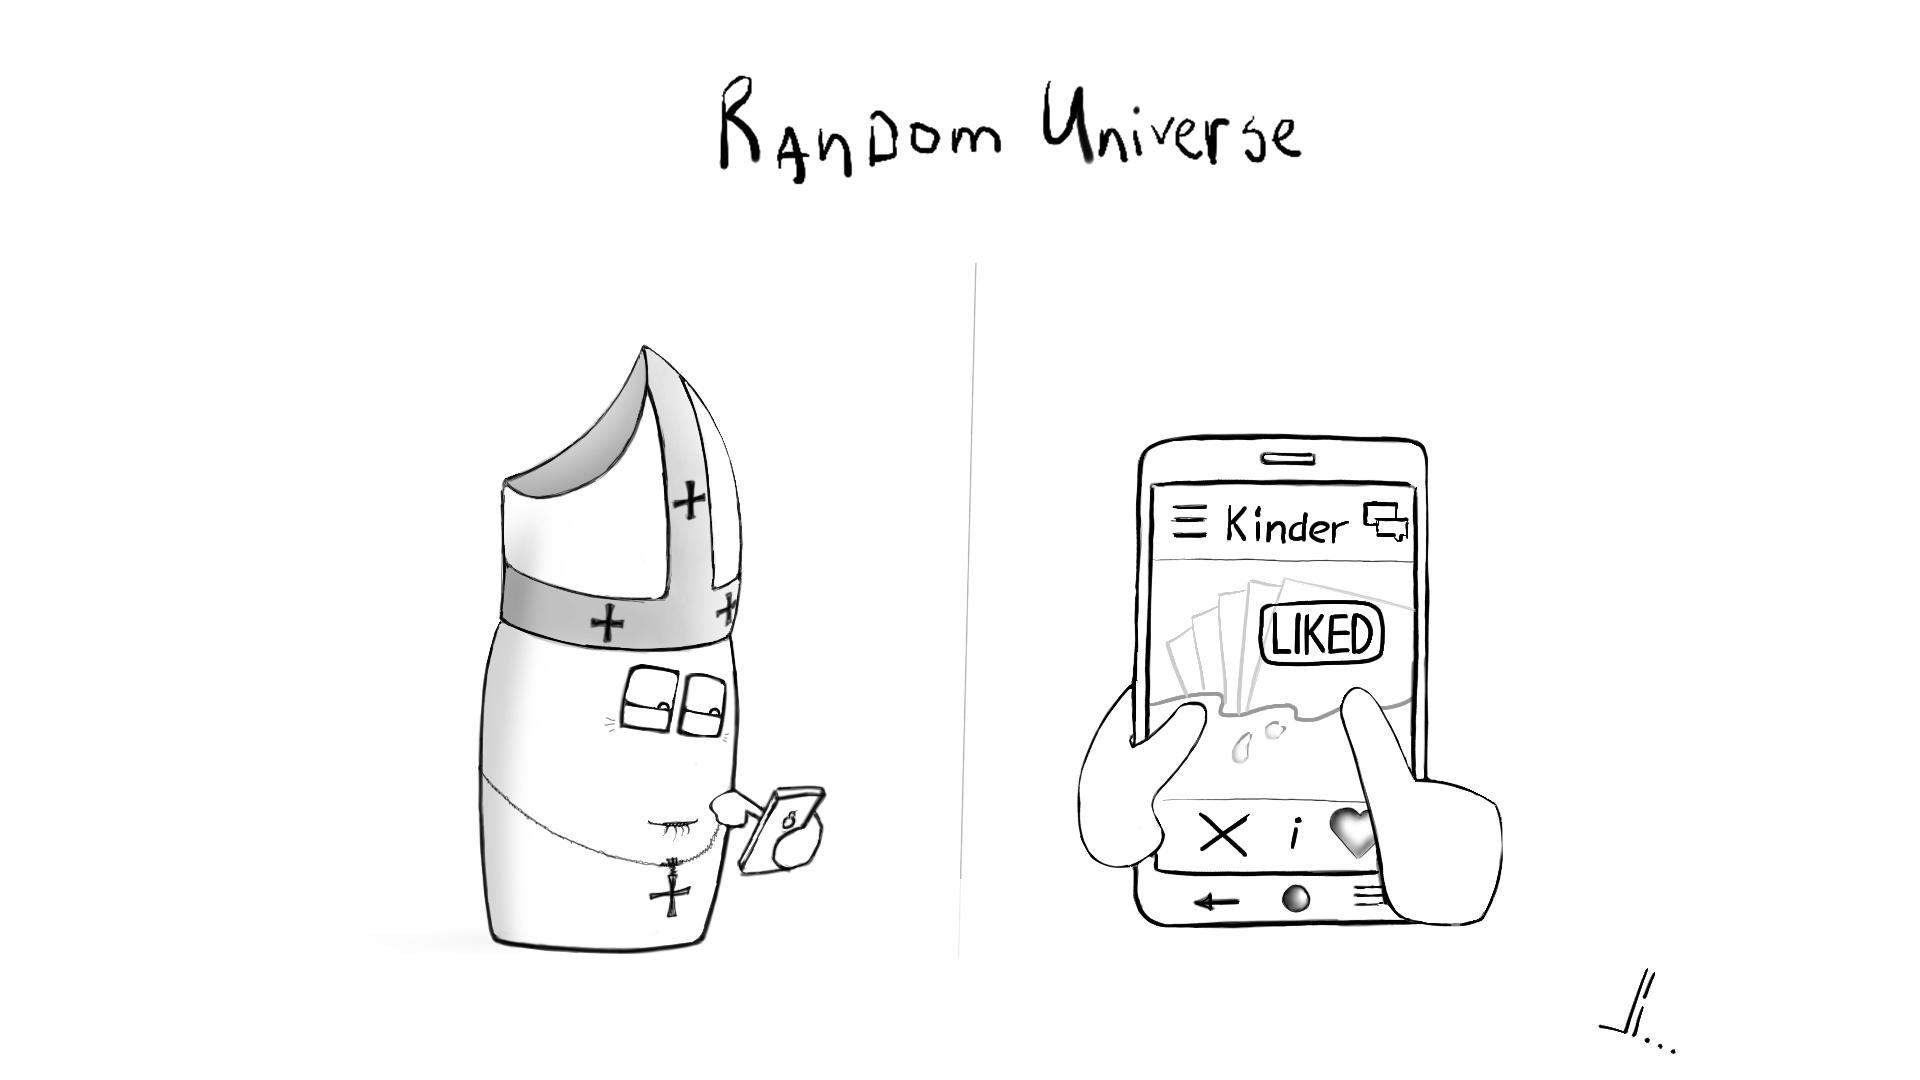 #8 - Random Universe - Kinder